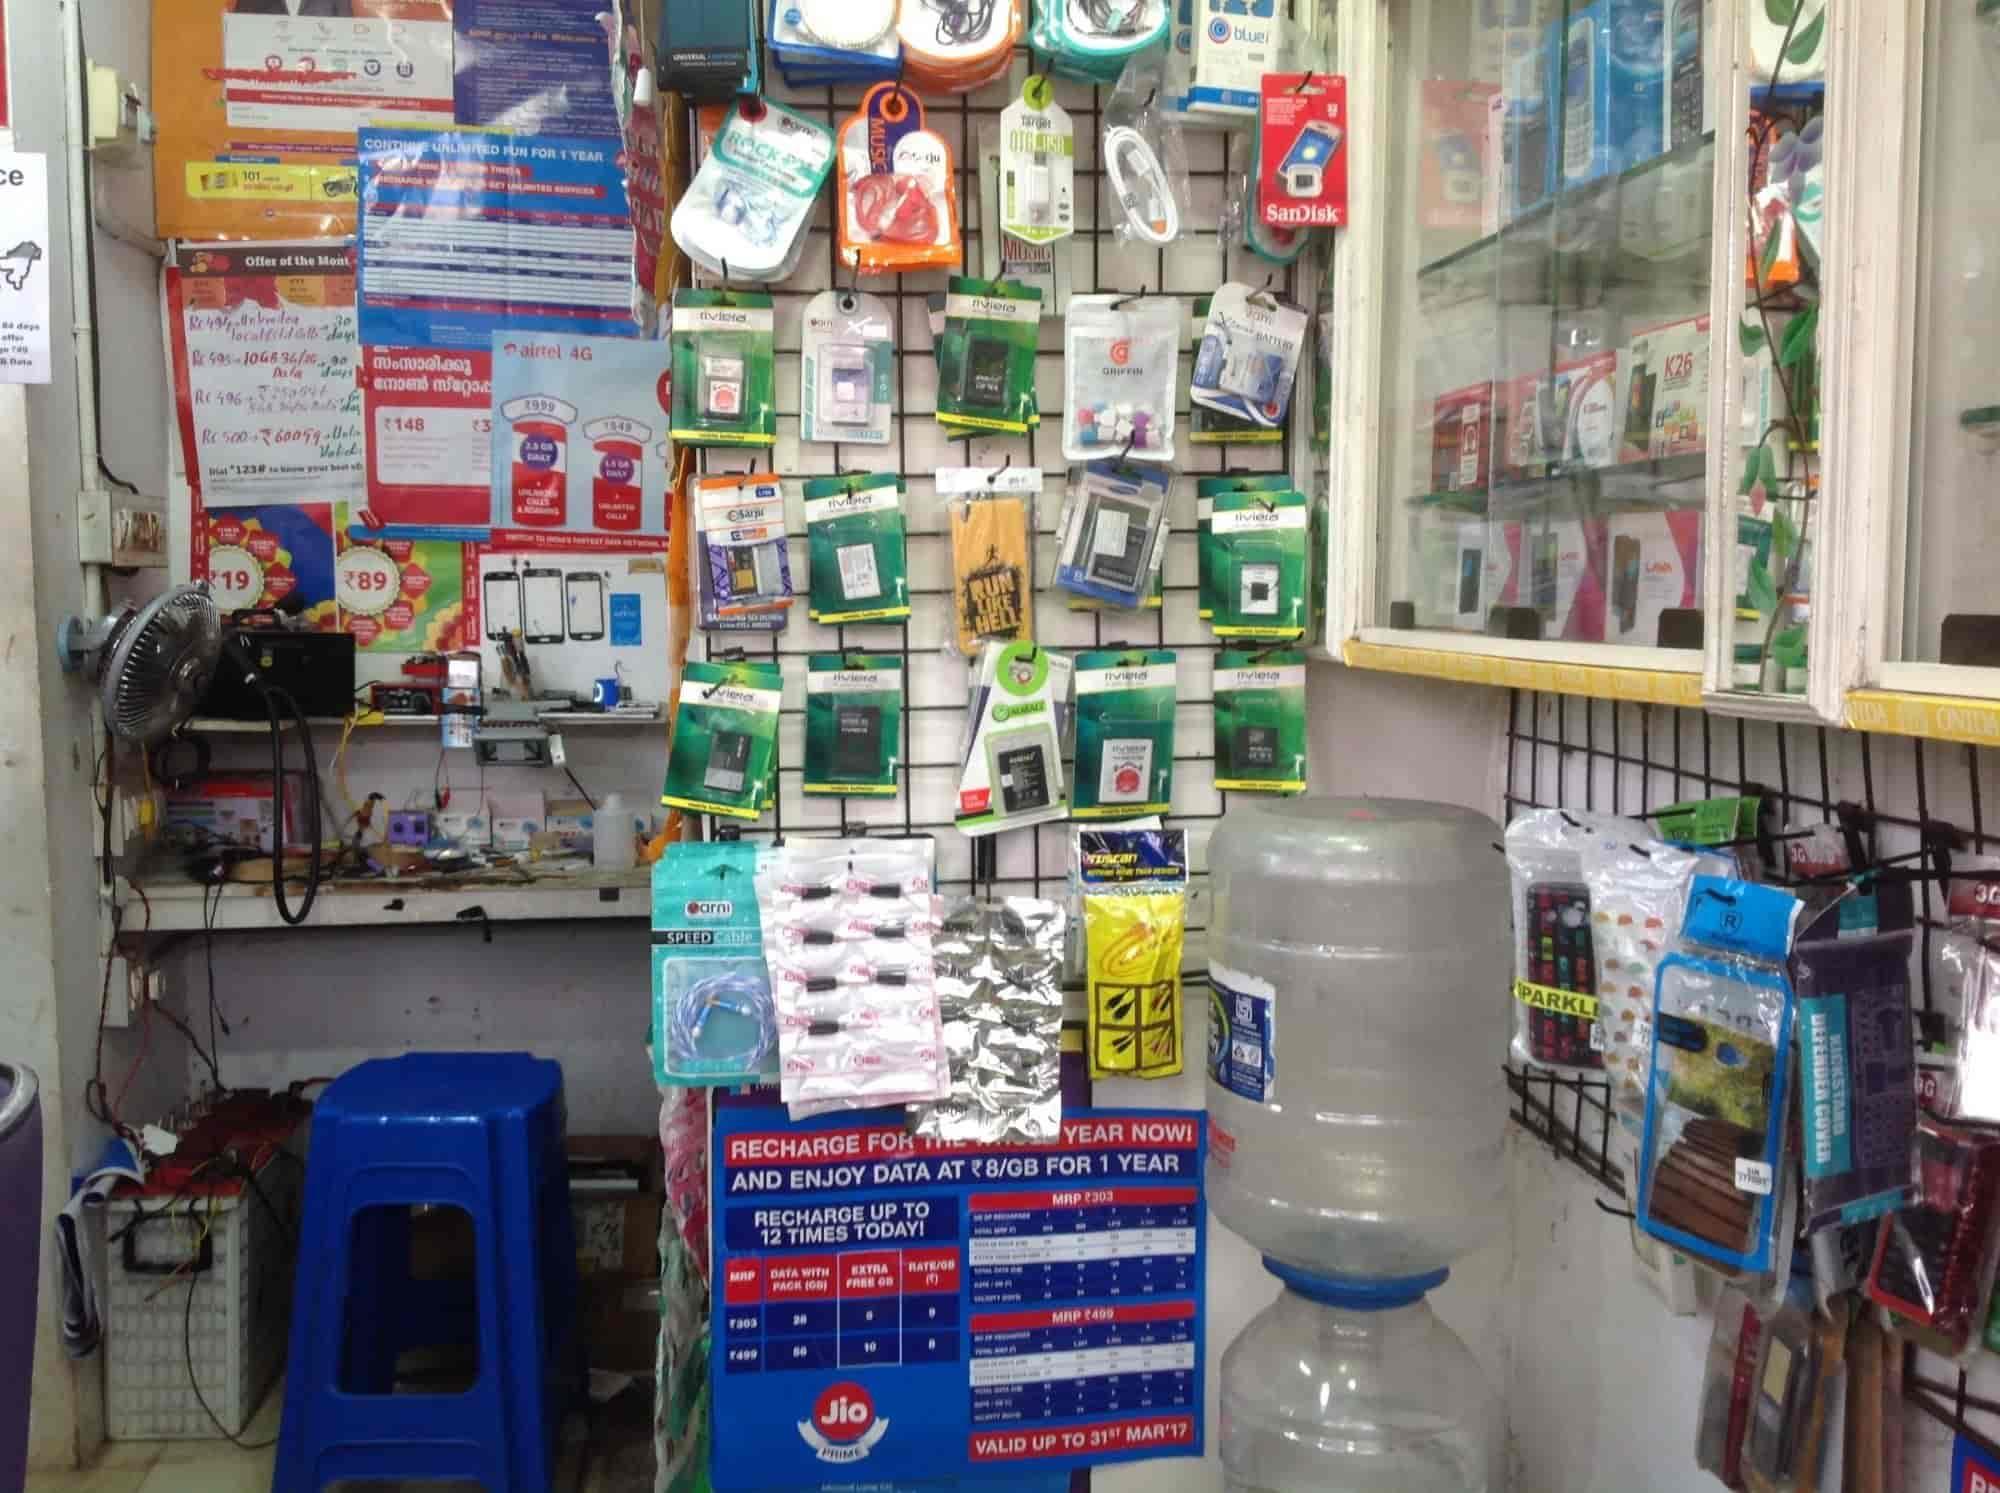 Mytel Mobile Shoppe, Kalamassery - Mobile Phone Dealers in Ernakulam